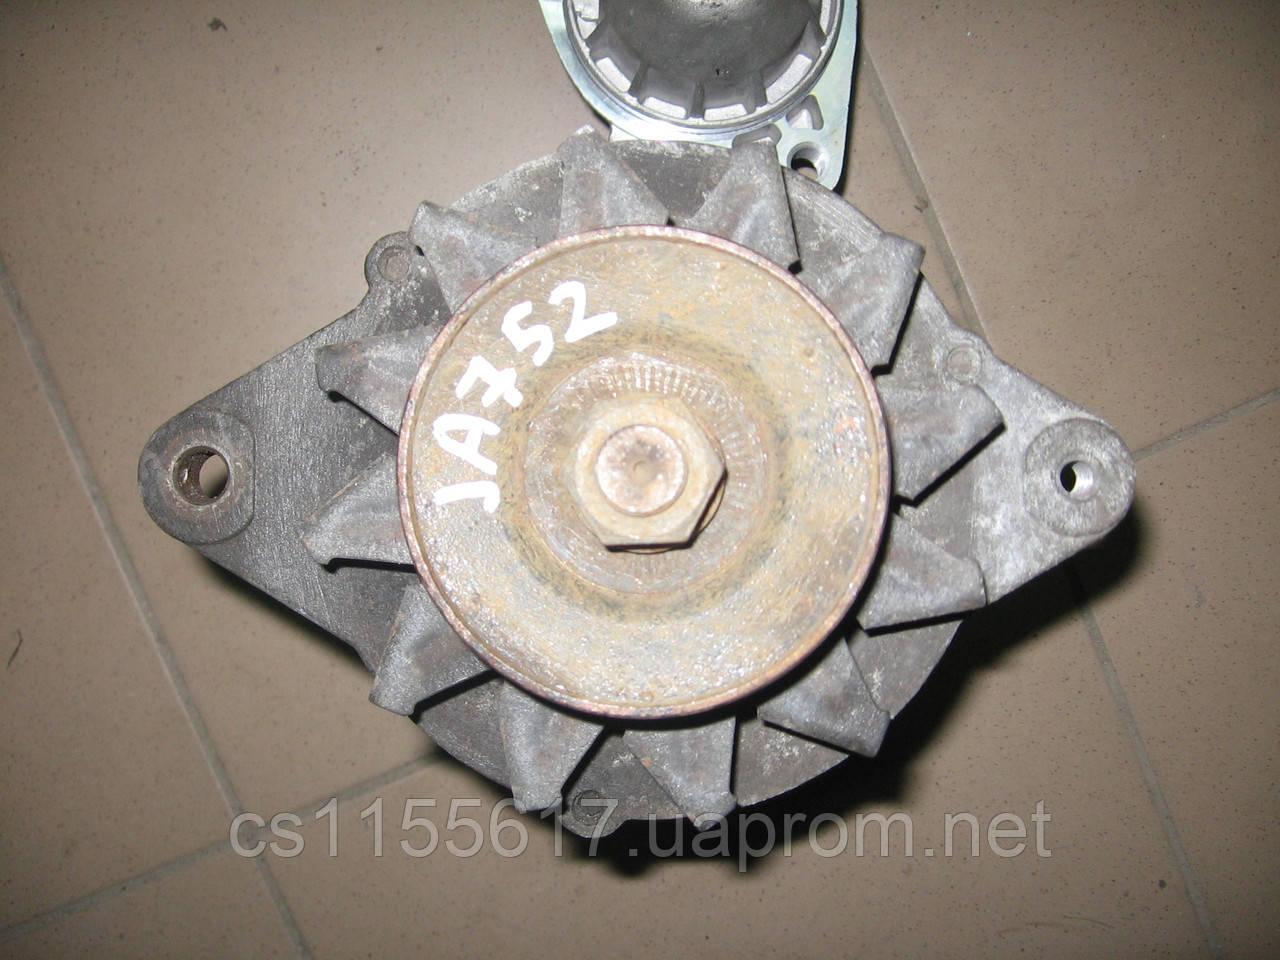 Генератор б/у на KIA K2700 SD KIA Pregio 2.7D Opel Omega 2.3D 0K65B18300A